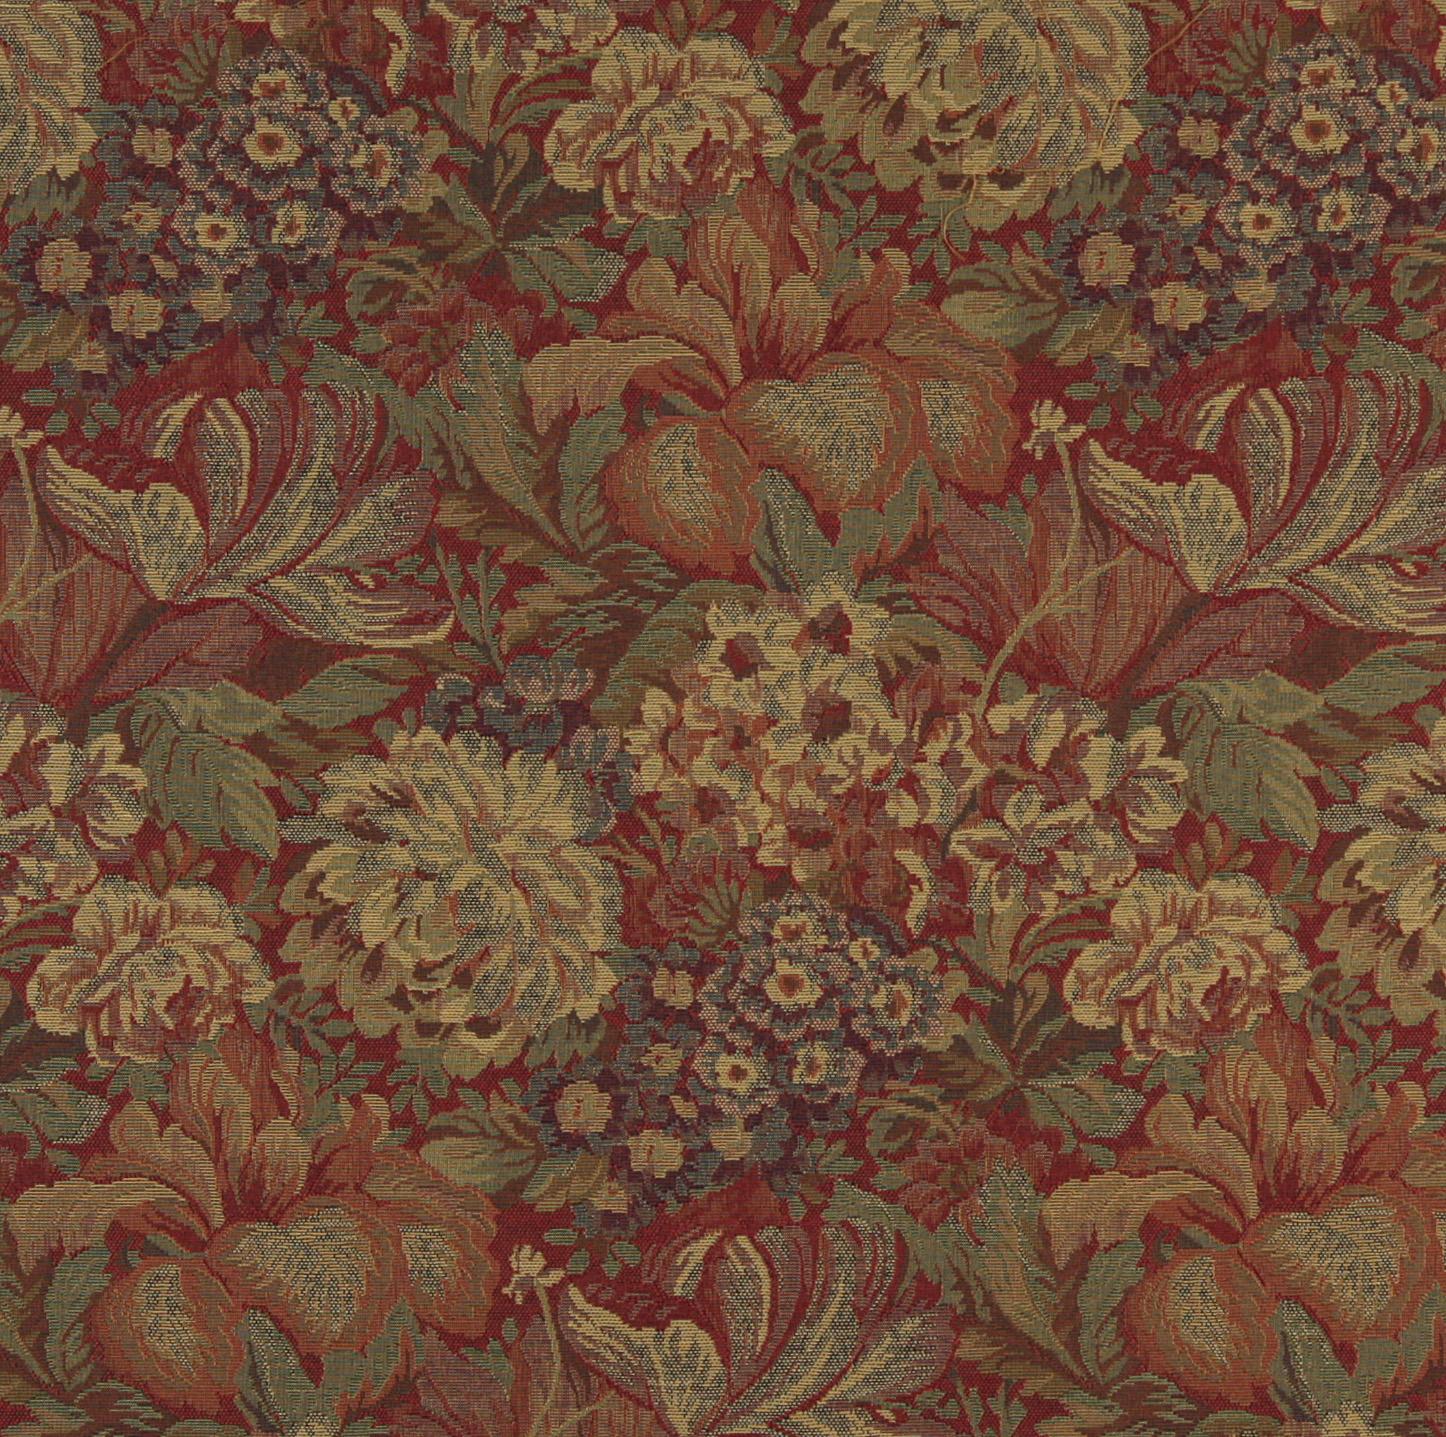 Blue Animal Print Wallpaper Beige And Burgundy Victorian Floral Garden Tapestry